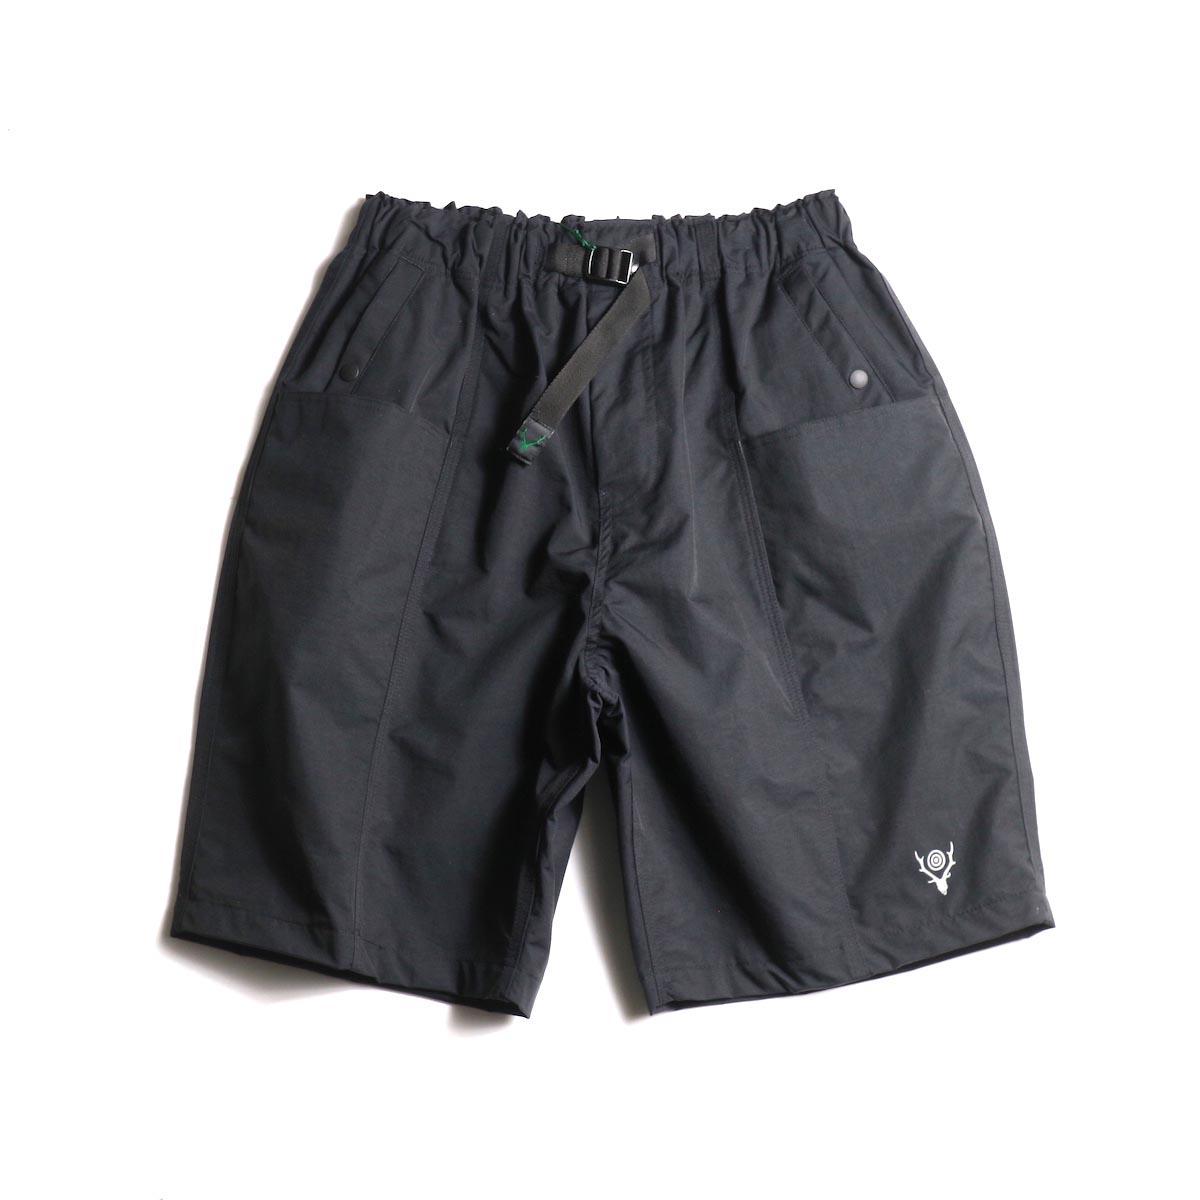 SOUTH2 WEST8 / Belted Center Seam Short -Nylon Tussore (Black)